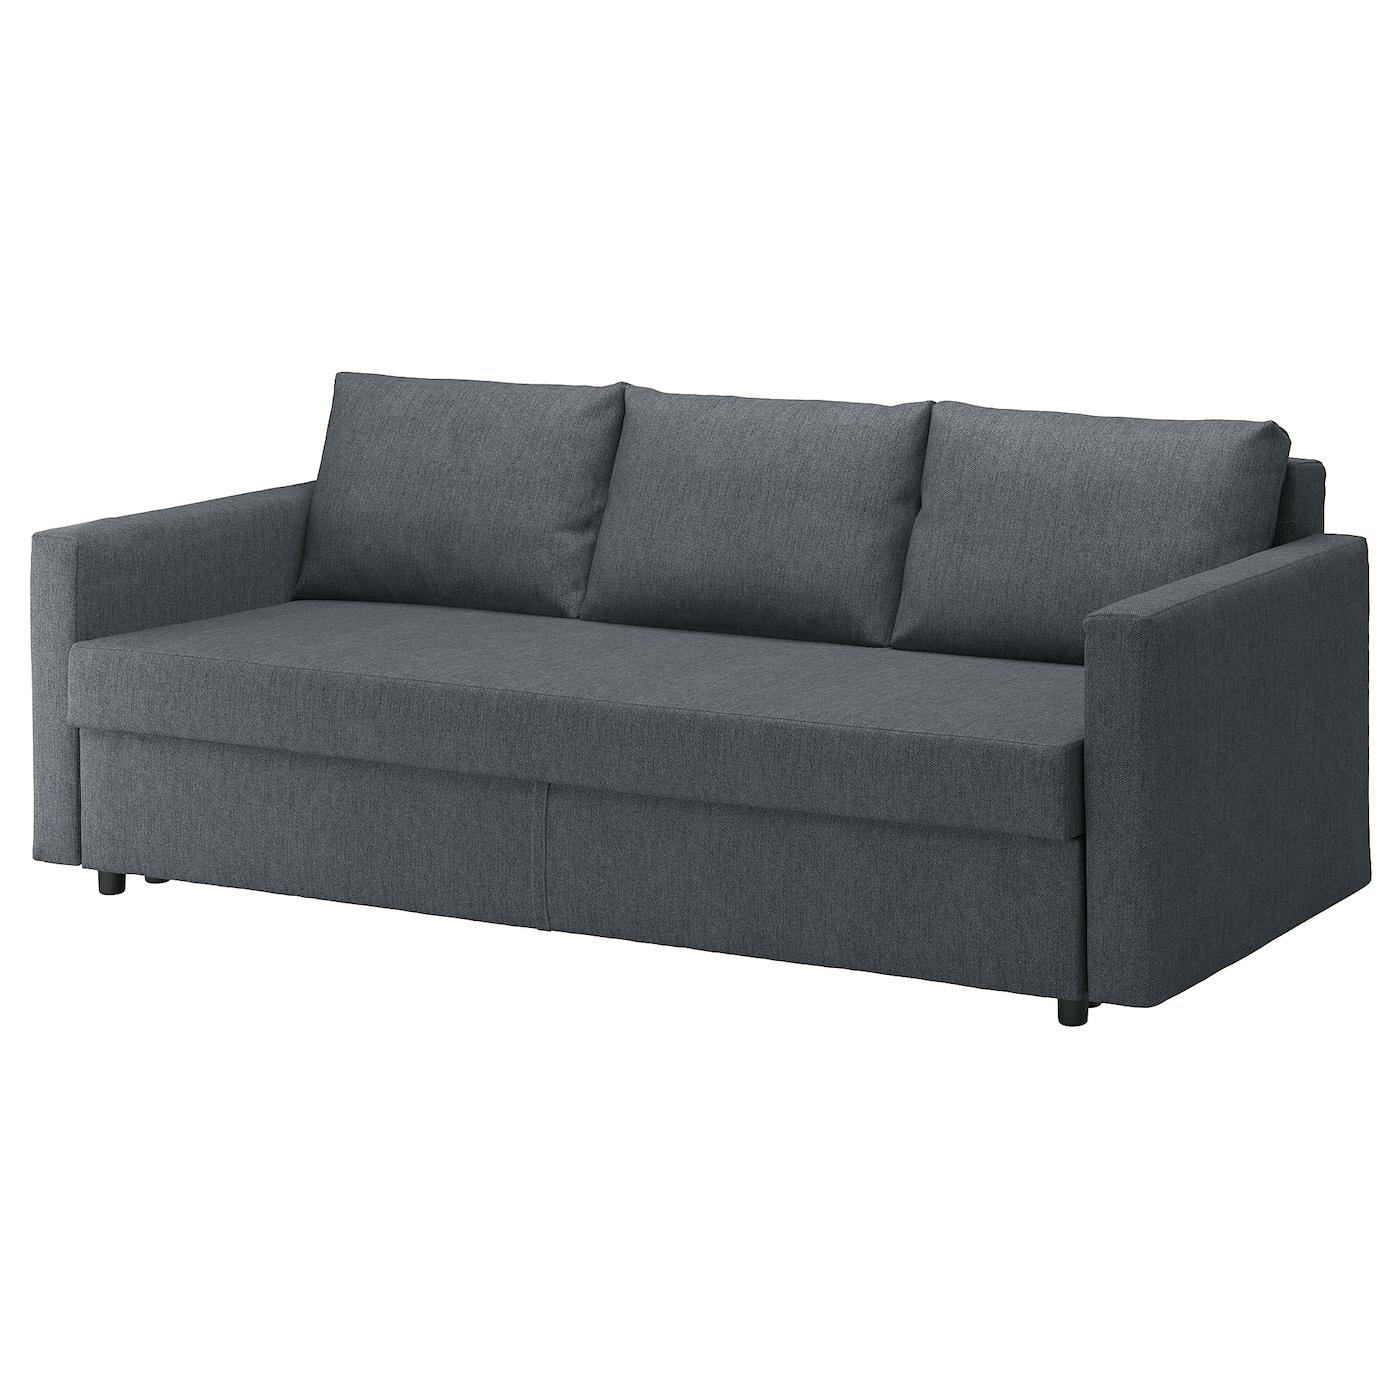 Friheten 3 Seat Sofa Bed Hyllie Dark